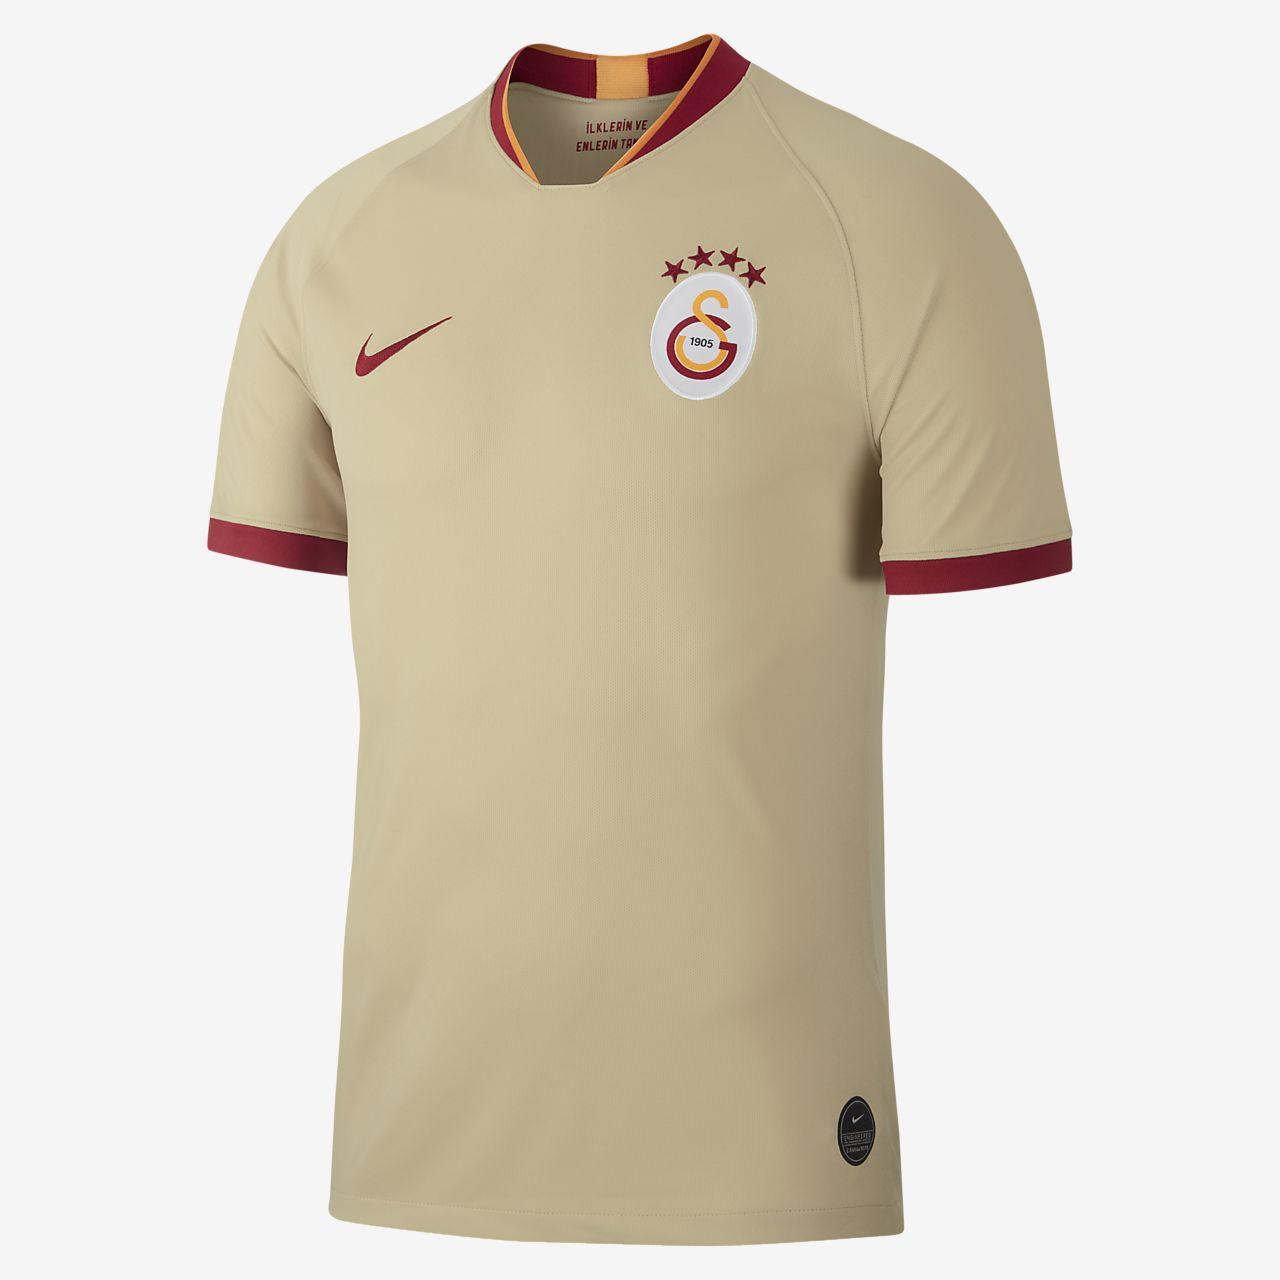 Maillot de football Galatasaray 2019/20 Stadium Away pour Homme